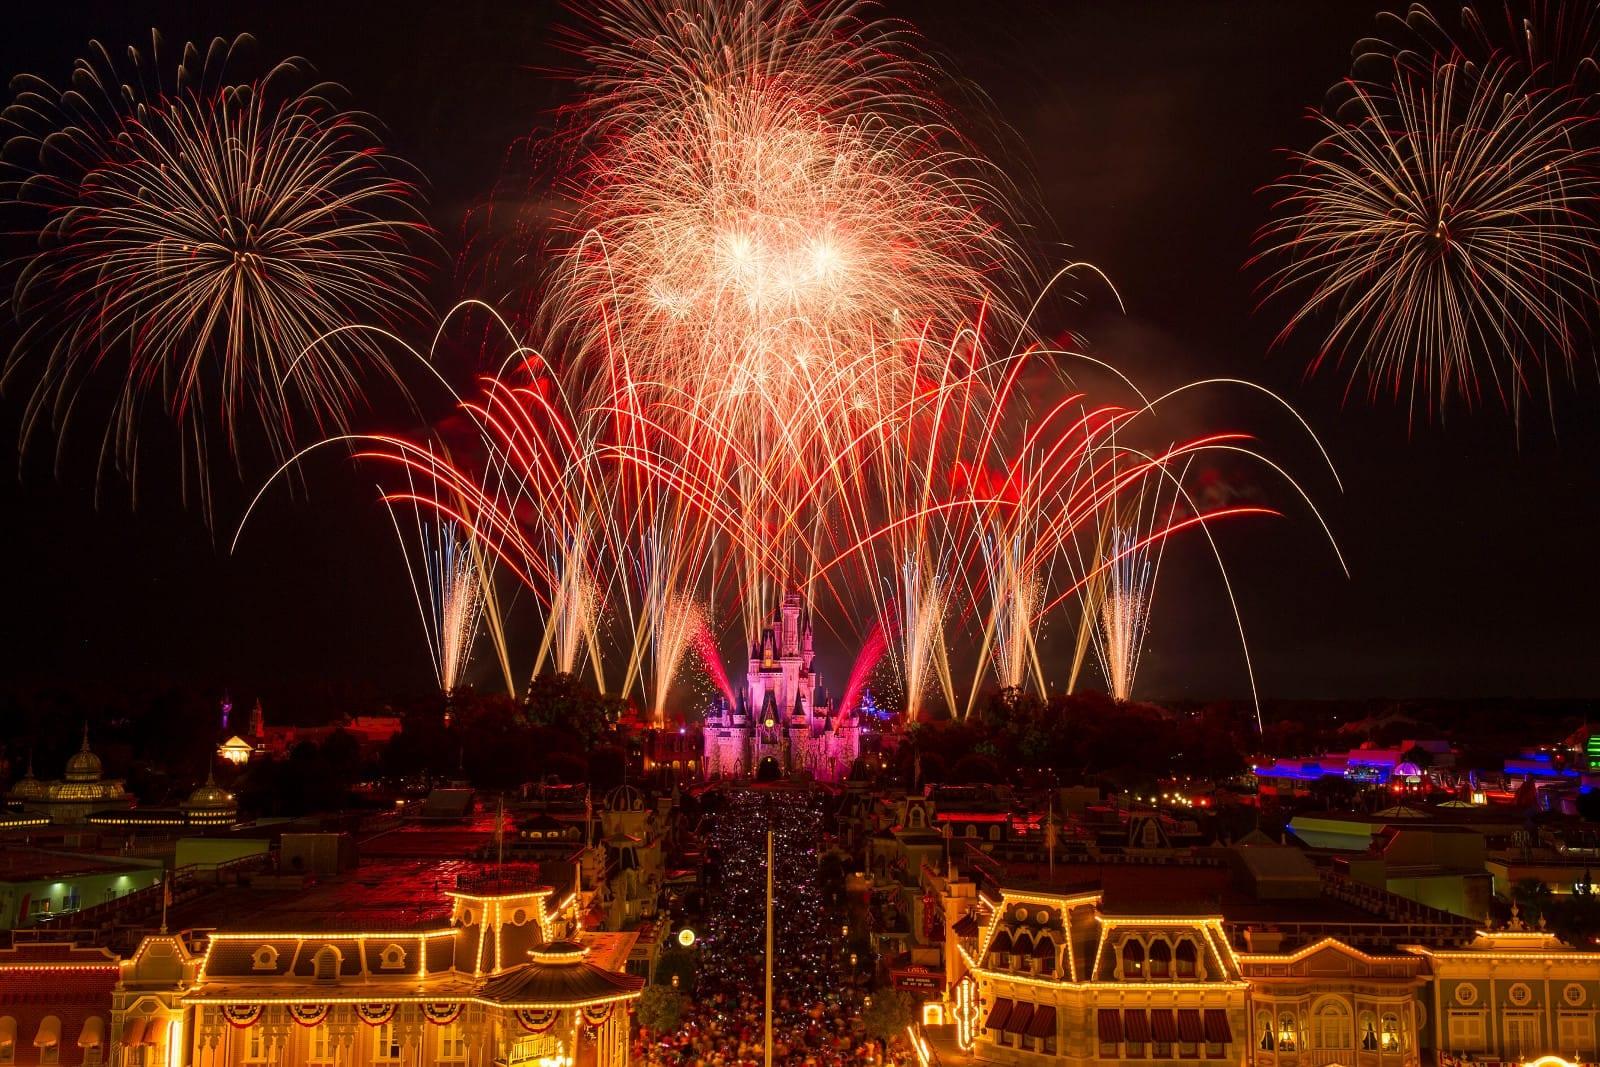 Walt Disney World Celebrates Independence Day 2018 With